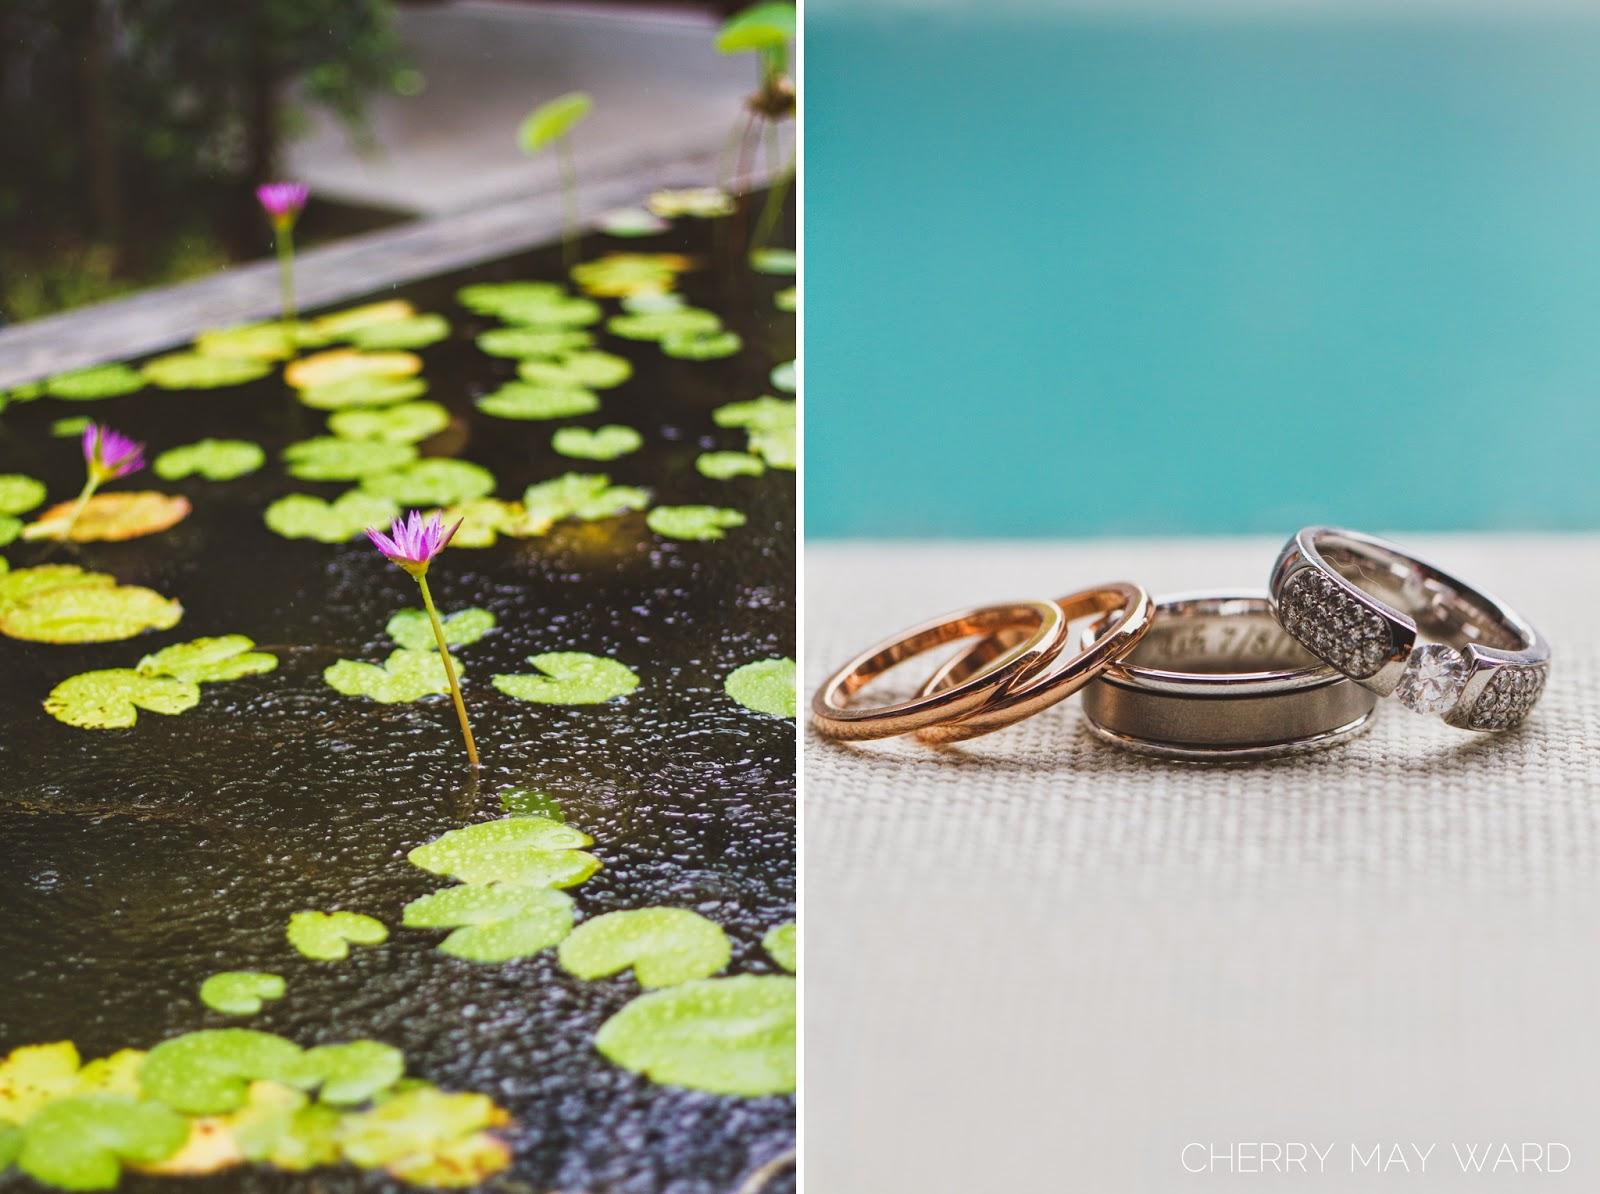 rain on wedding day, wedding rings photo, beautiful wedding rings, wedding bands, beautiful diamond engagement ring, Koh Samui wedding photographer